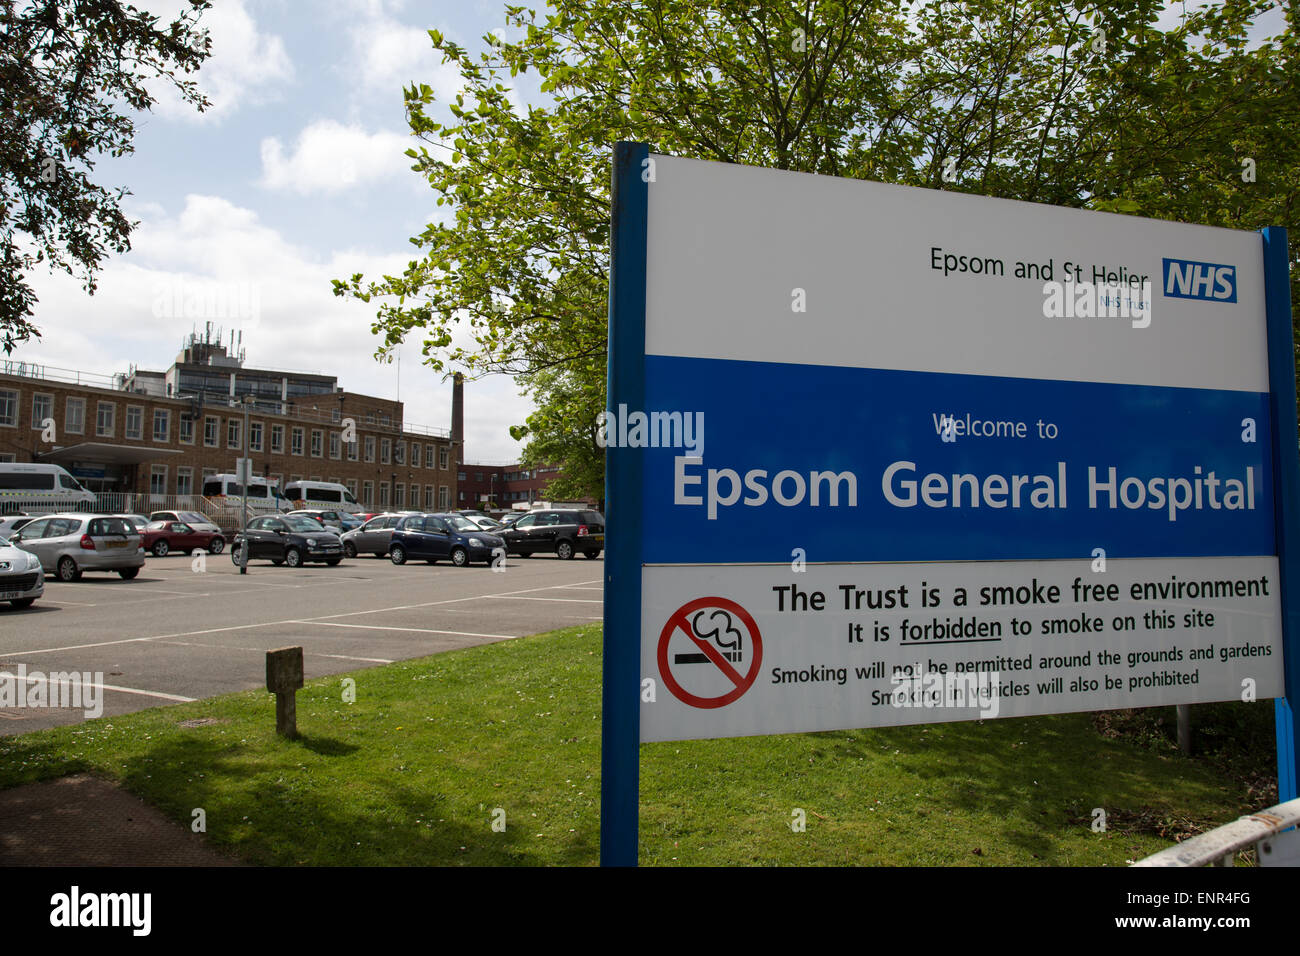 Epsom General Hospital - Stock Image